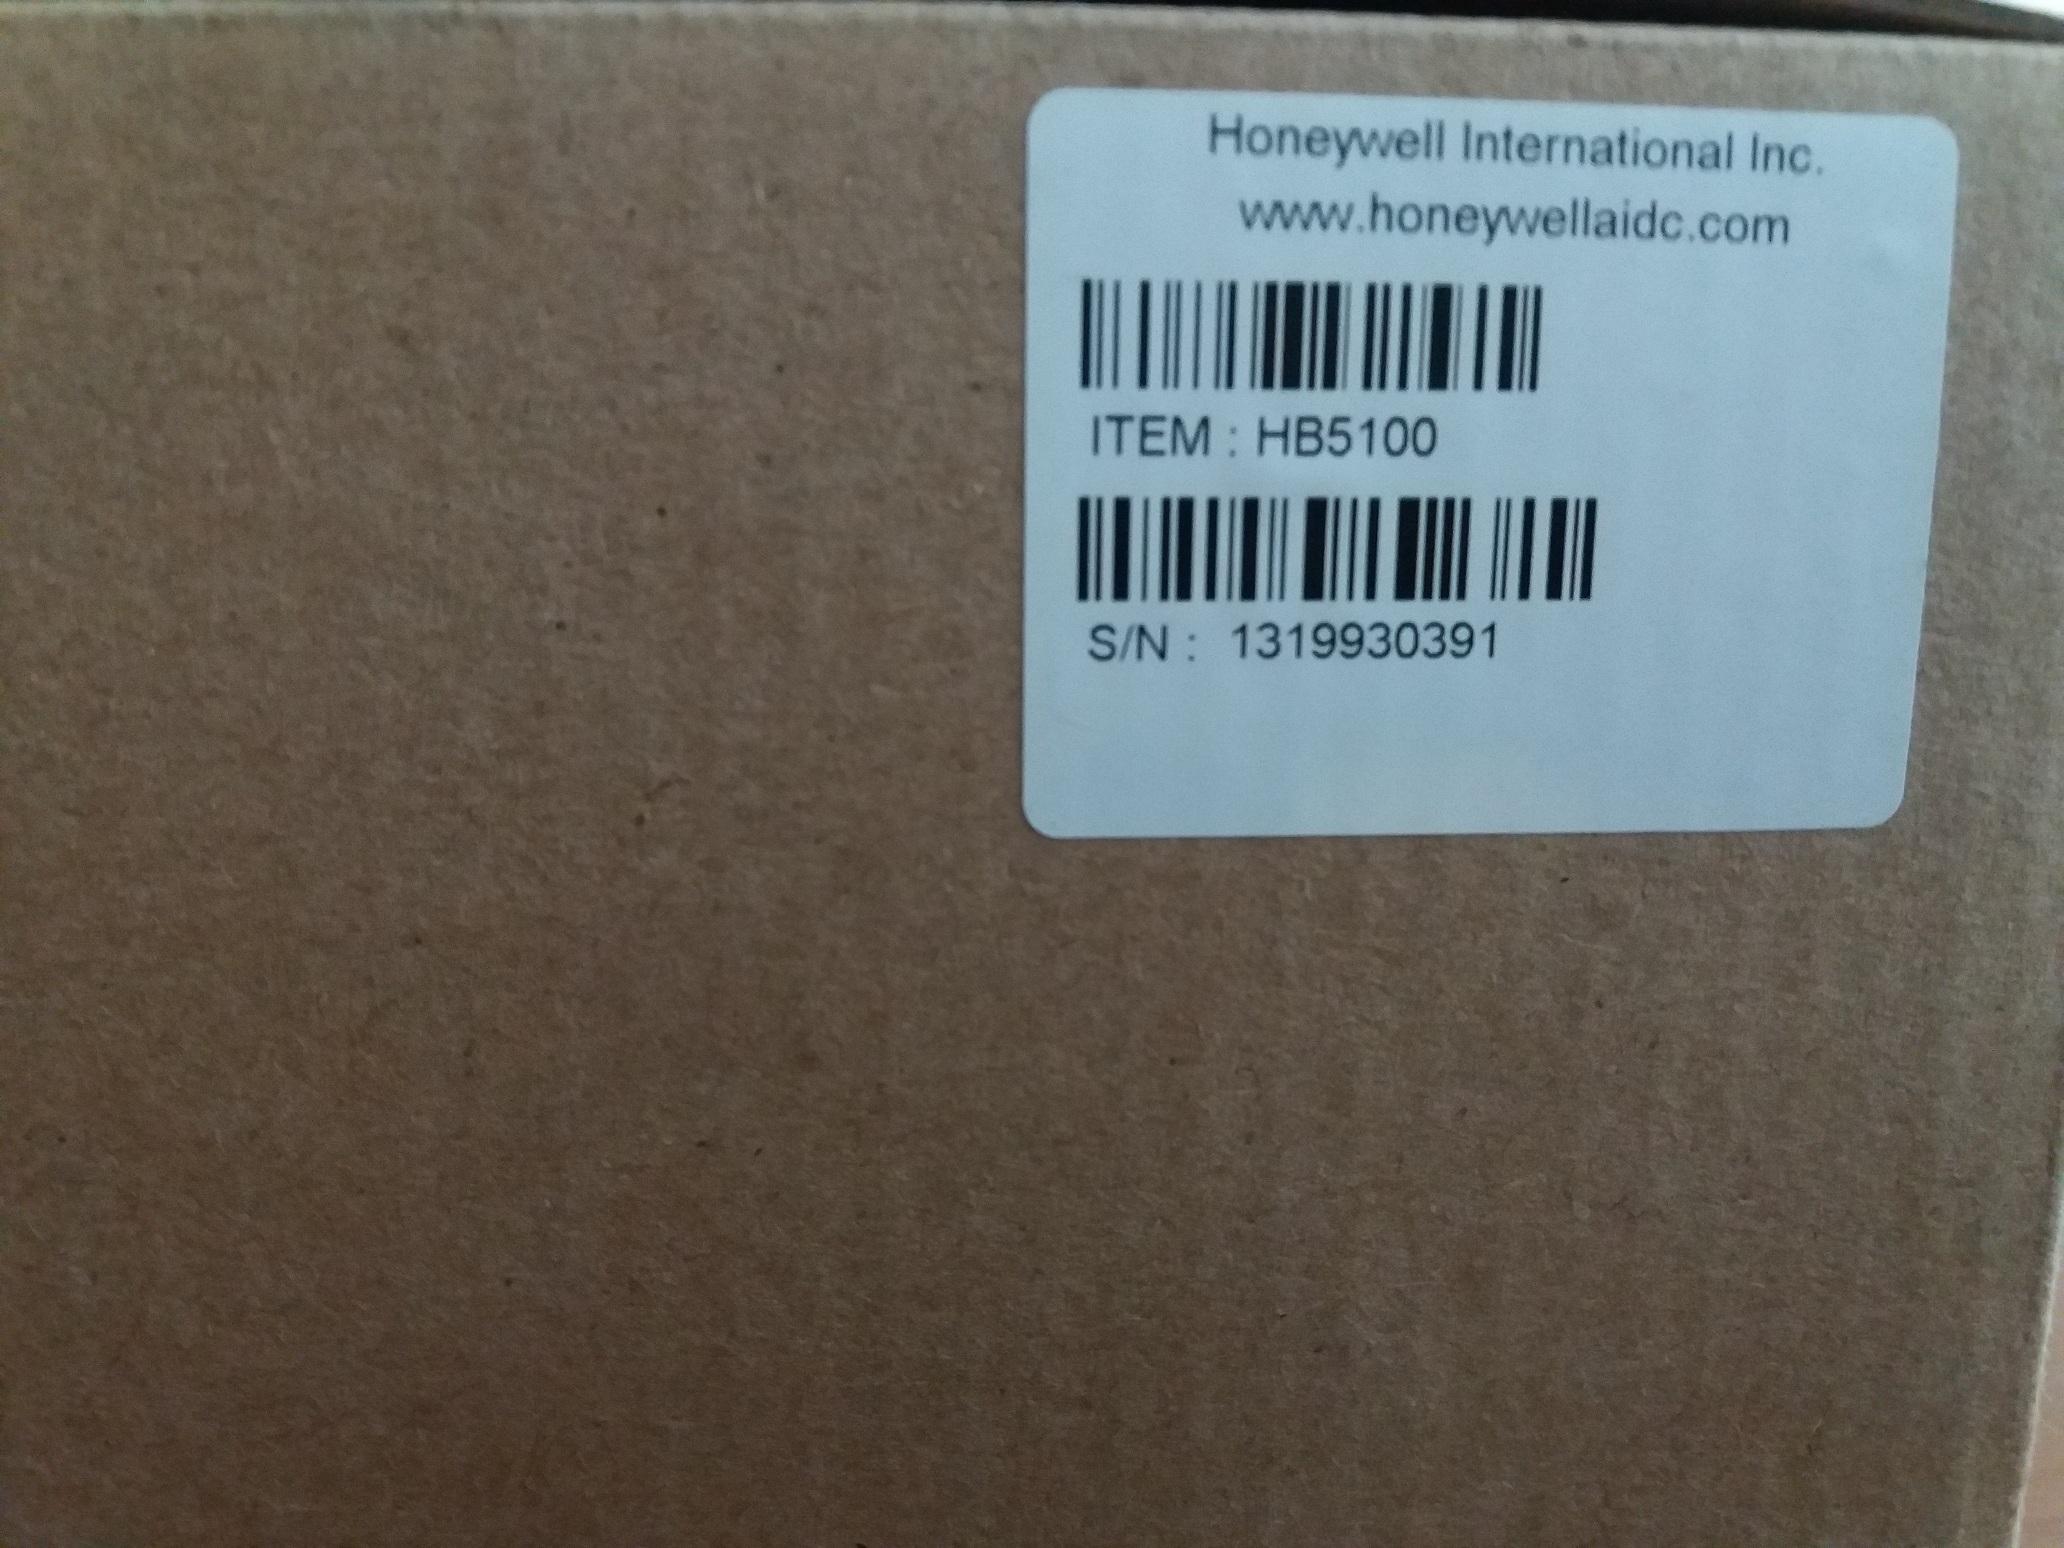 Honeywell hb5100